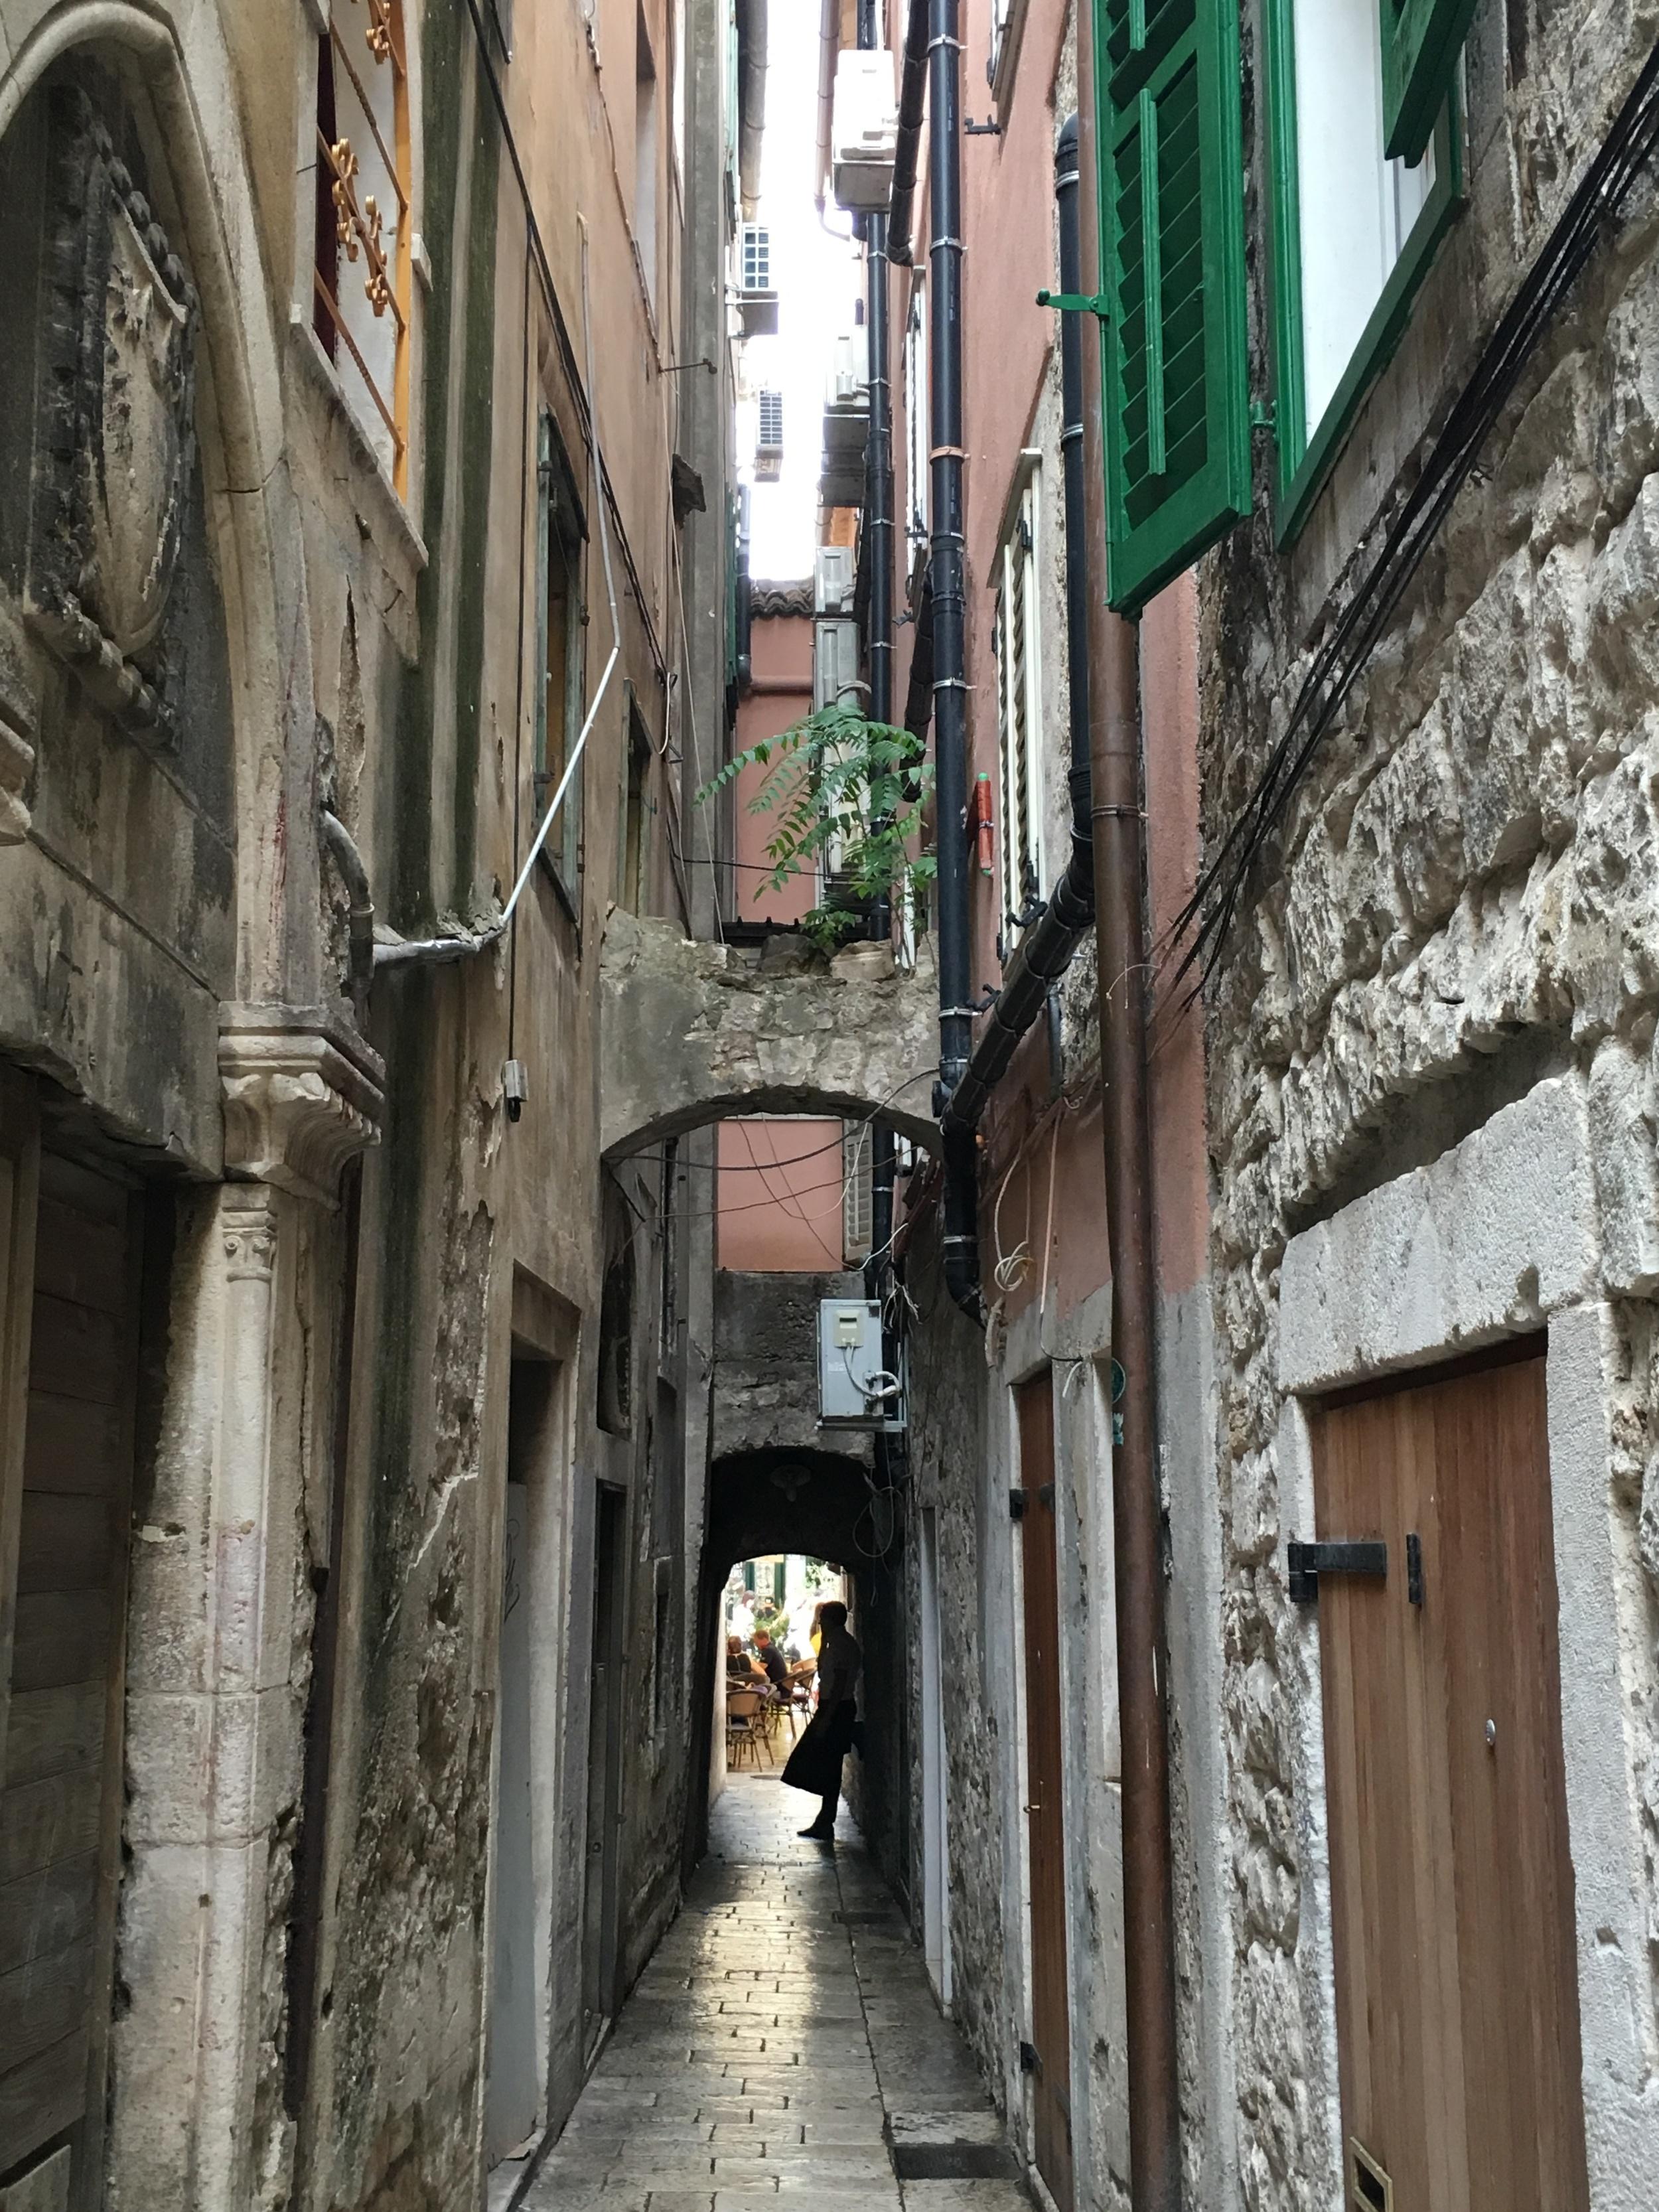 Another narrow street. Waiter taking a break from busy restaurant duties.